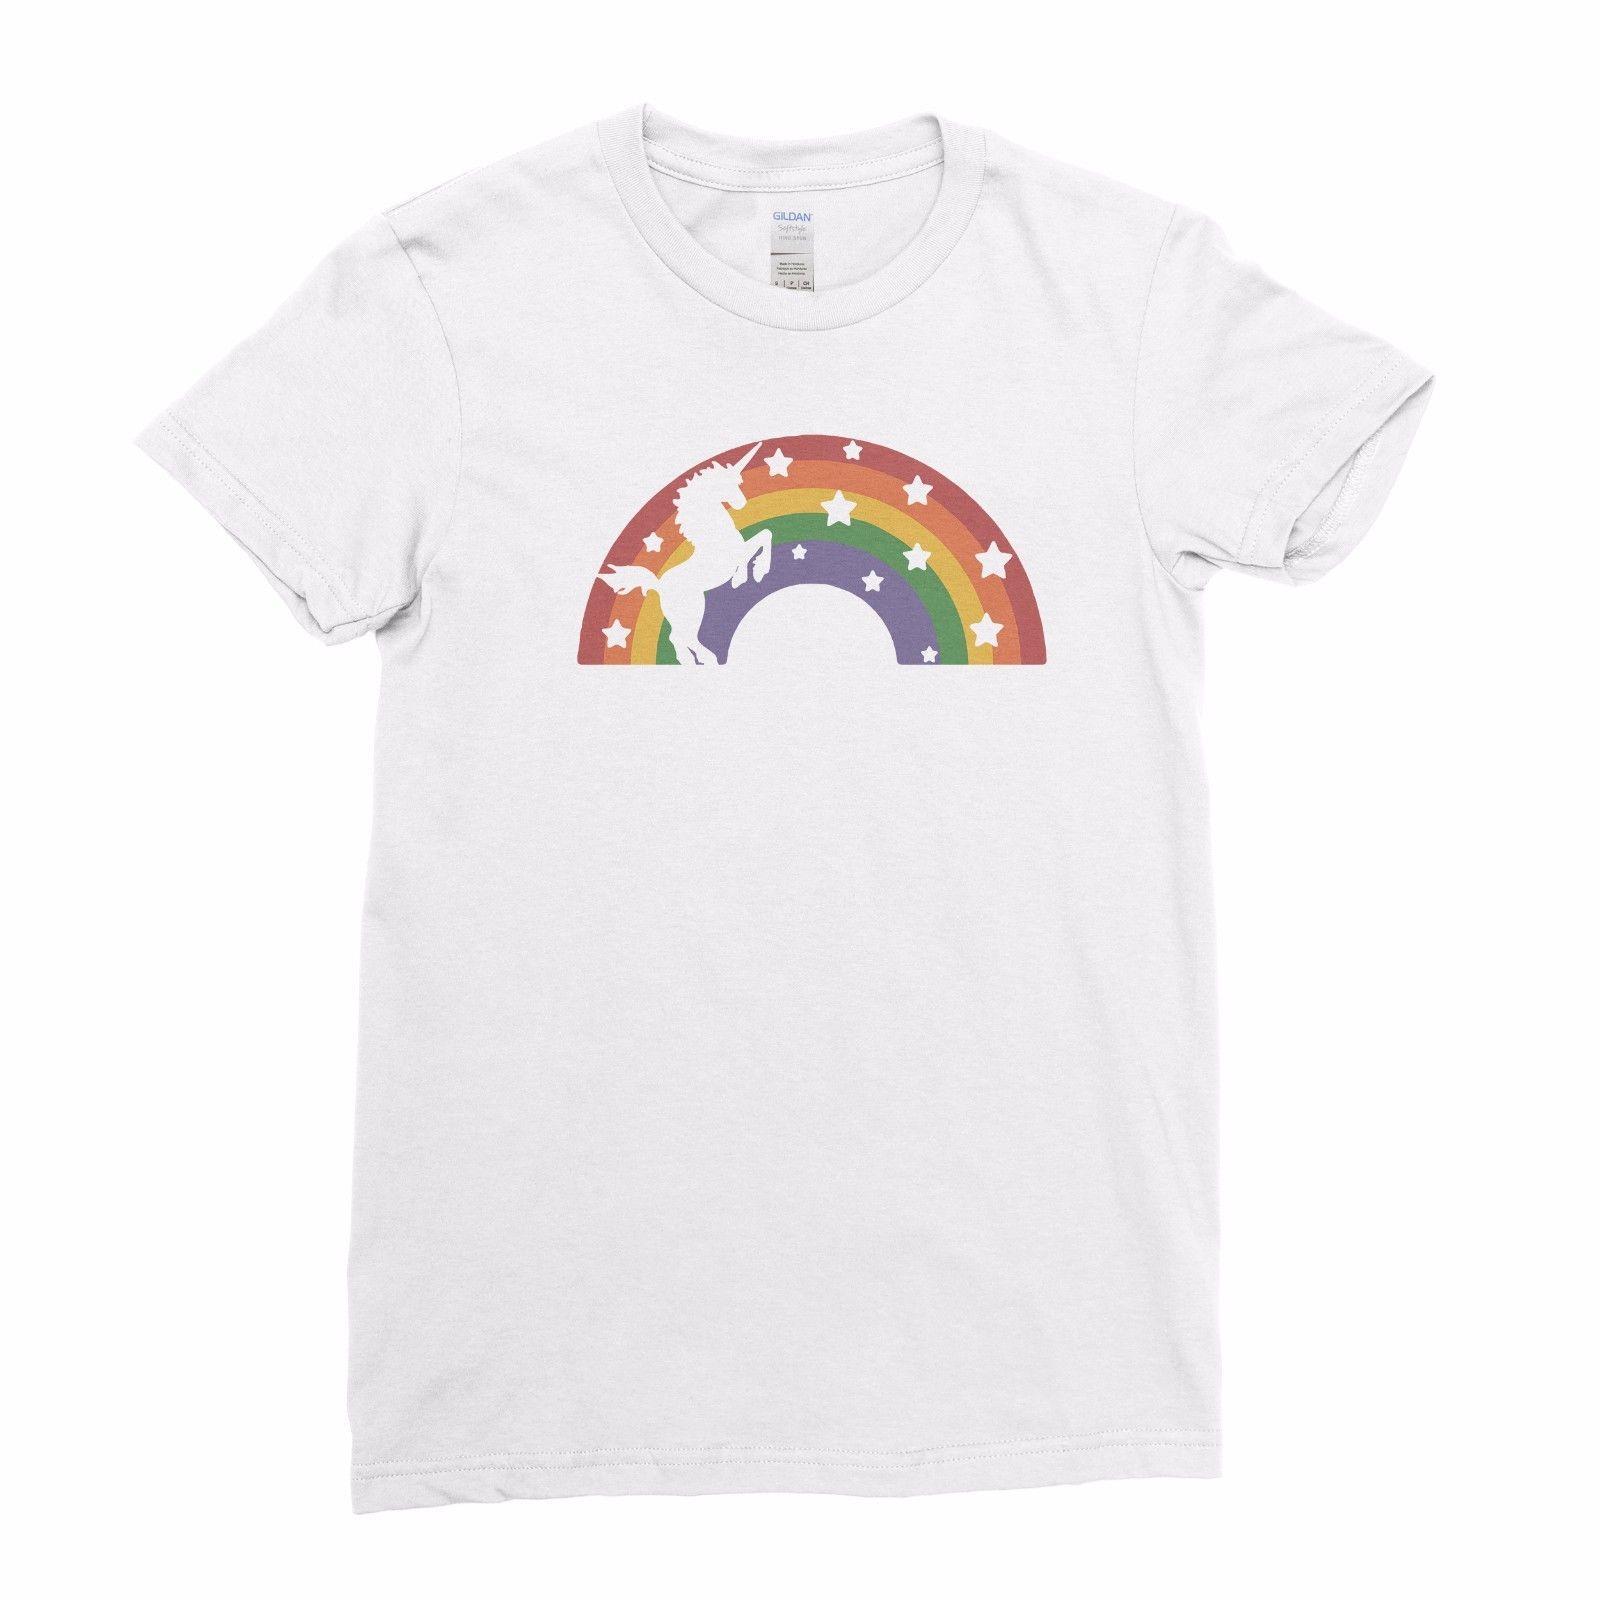 a17349be070c Retro Unicorn Rainbow Colours Funny Girly Ladies Women Girls T Shirt Top Tee  Cool Casual Pride T Shirt Men Unisex New Fashion Online Shop T Shirt Shirts  ...